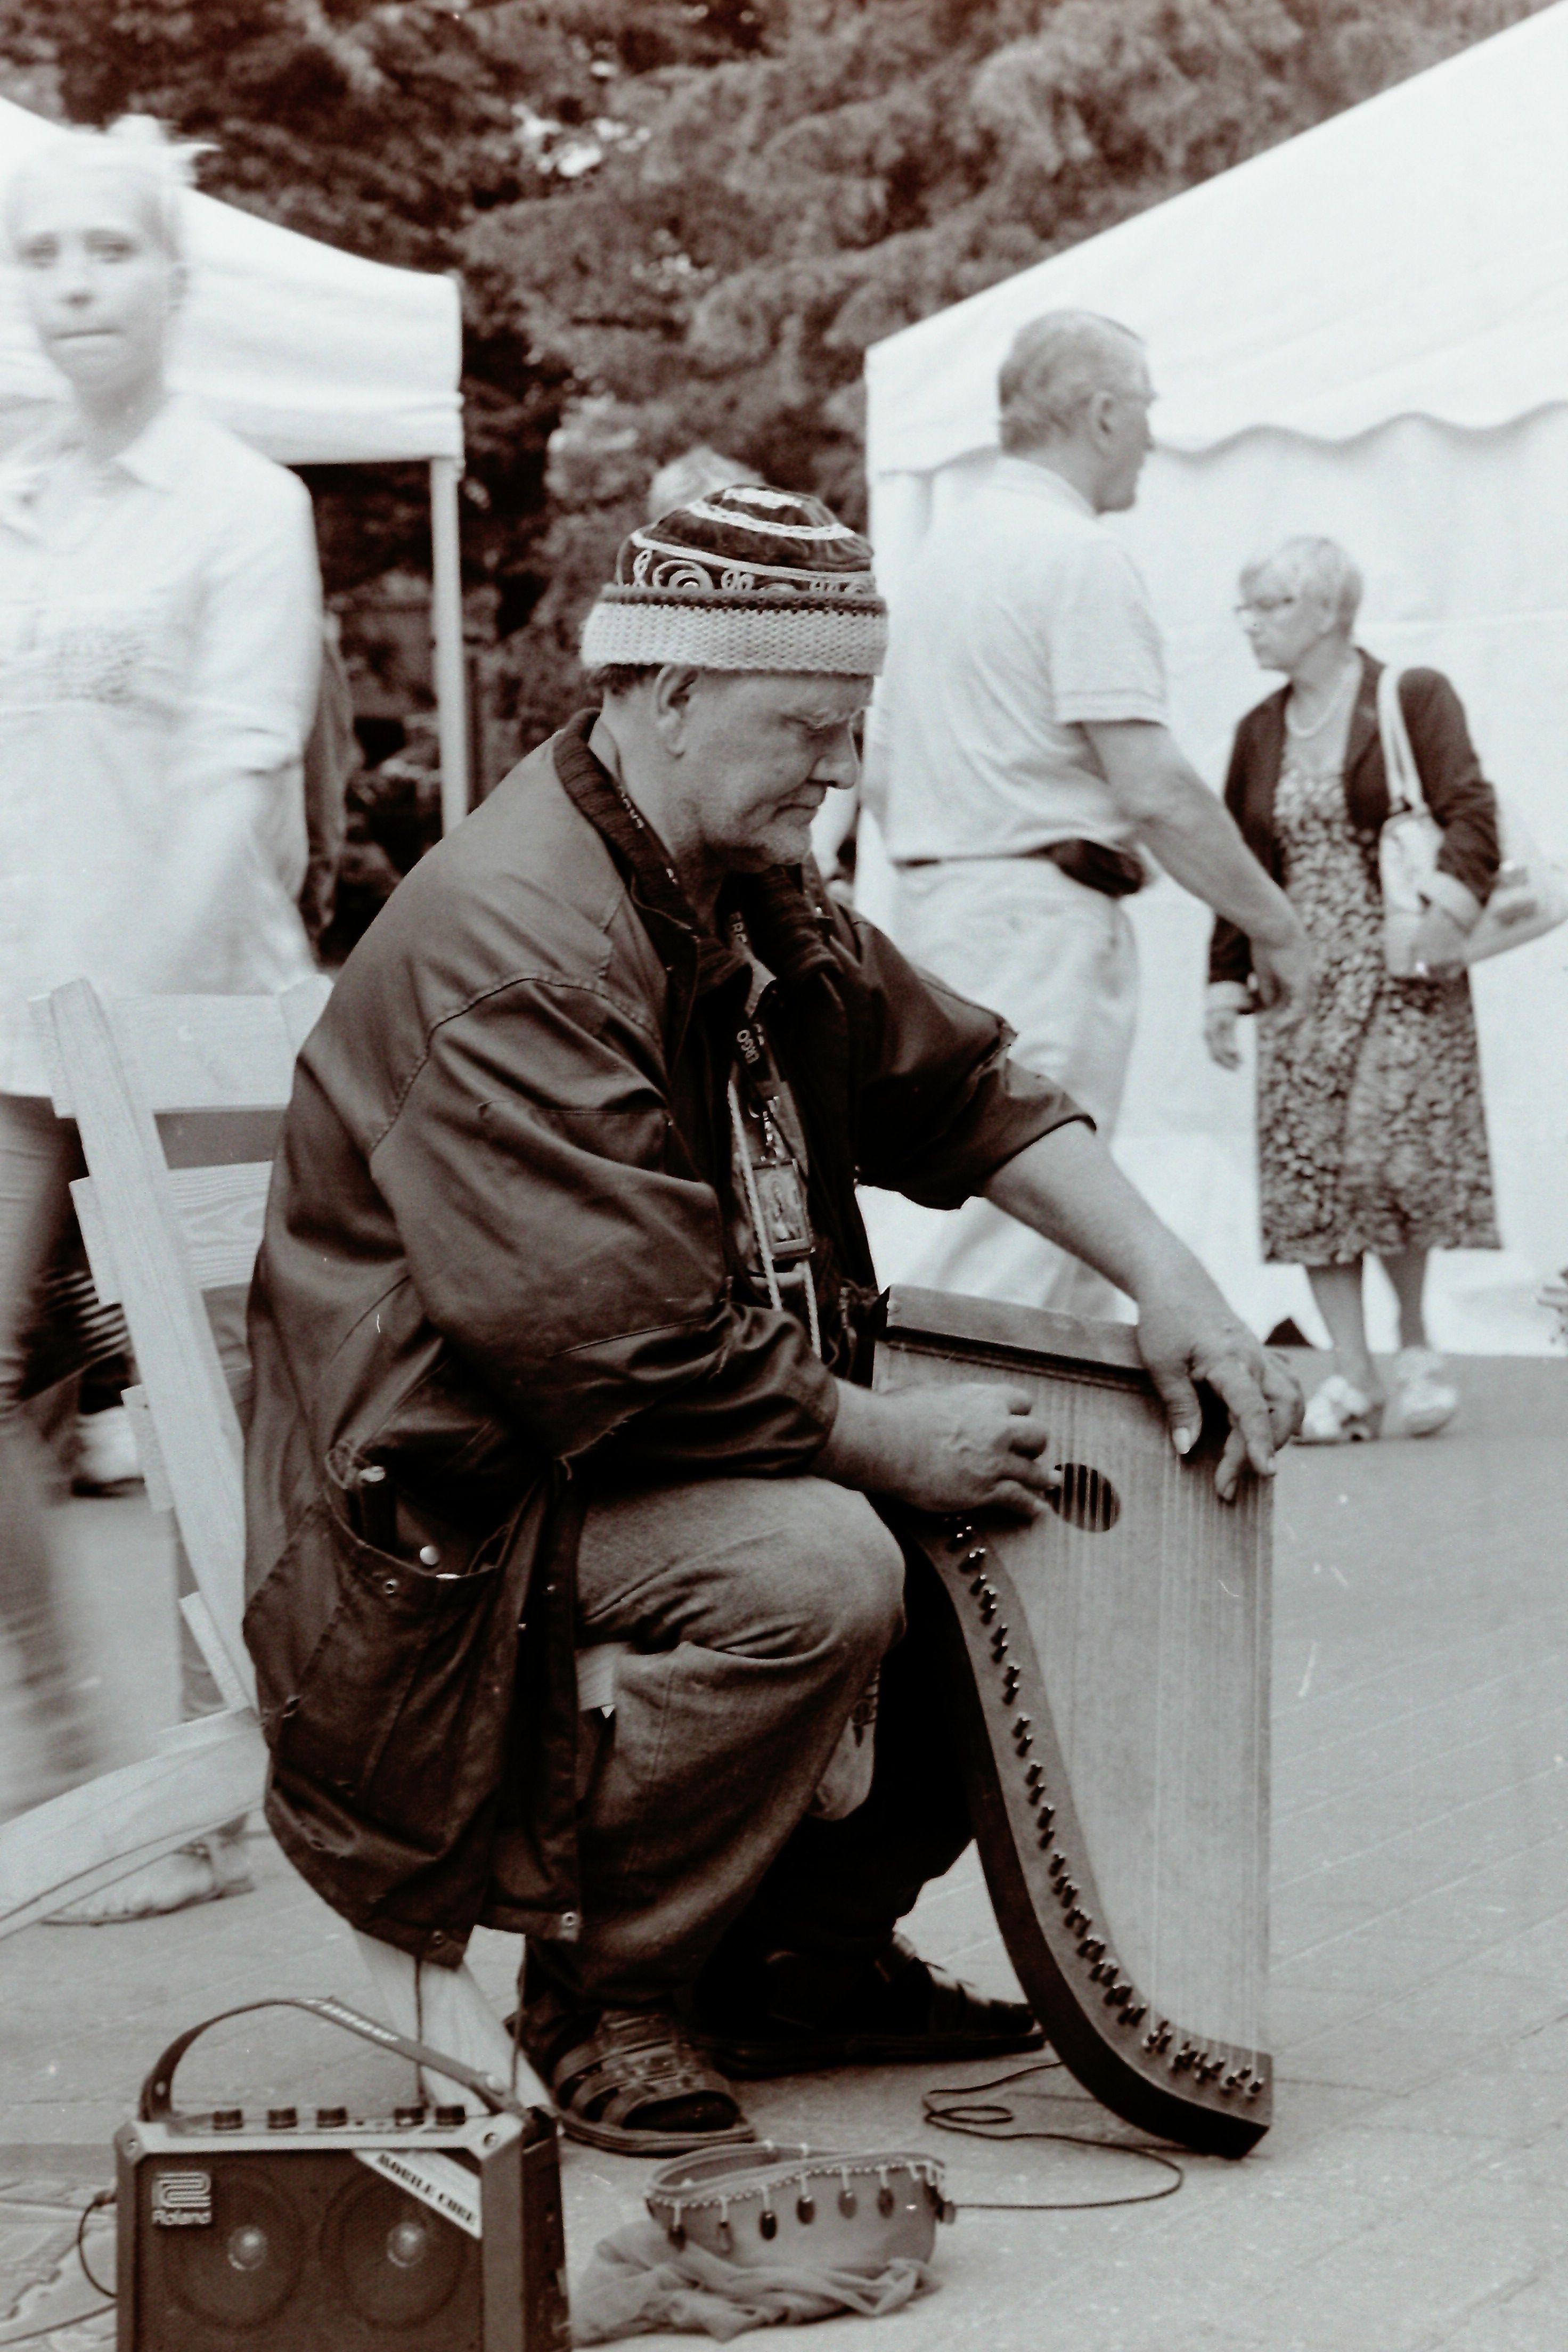 Old music man Author: © Madis - Siim Kull | B&W | The long goodbye